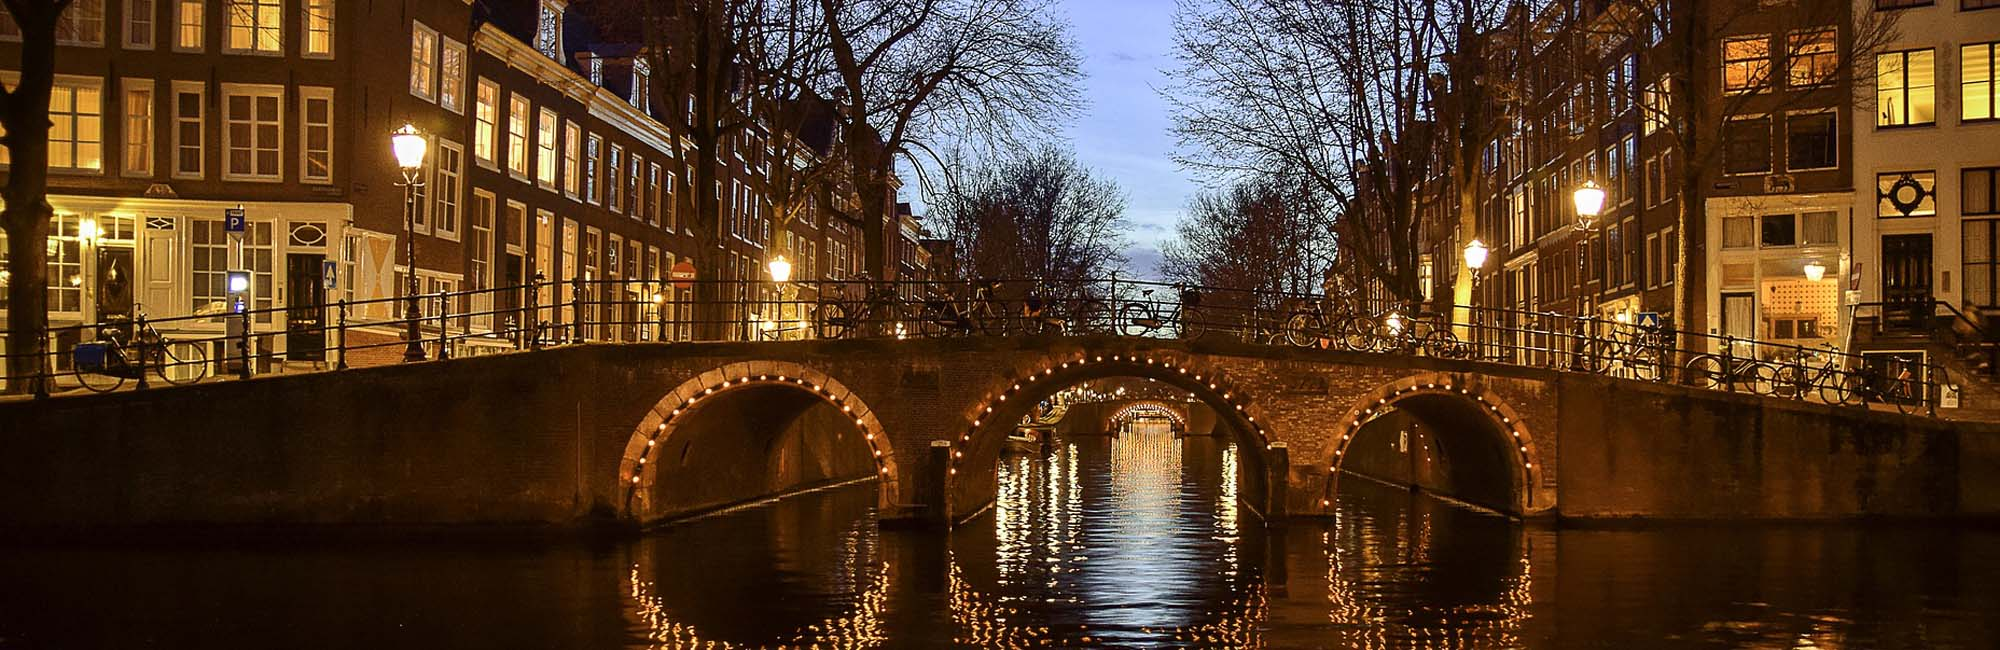 vip-service-Amsterdam-2